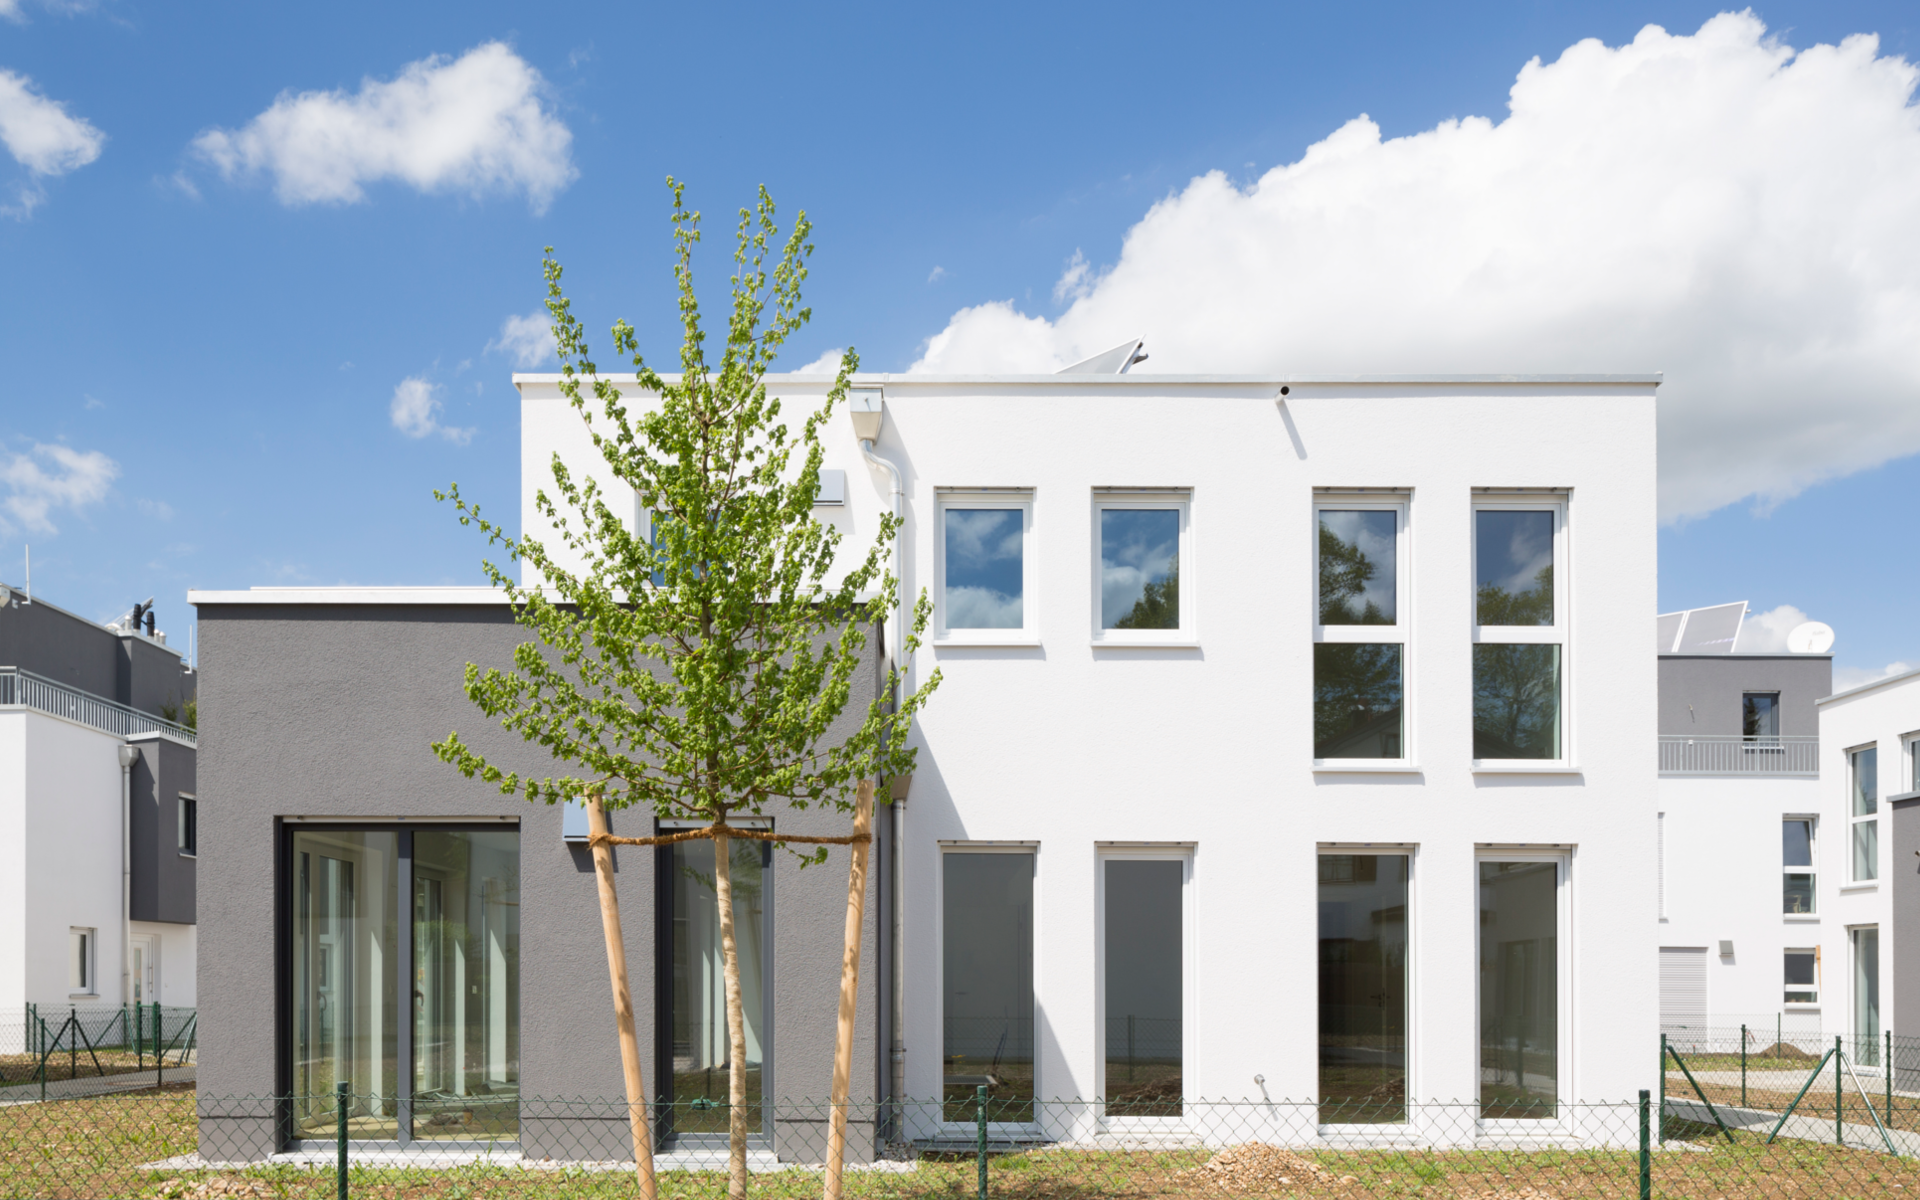 LHOMES_Veilchenweg Haus_1920x1200